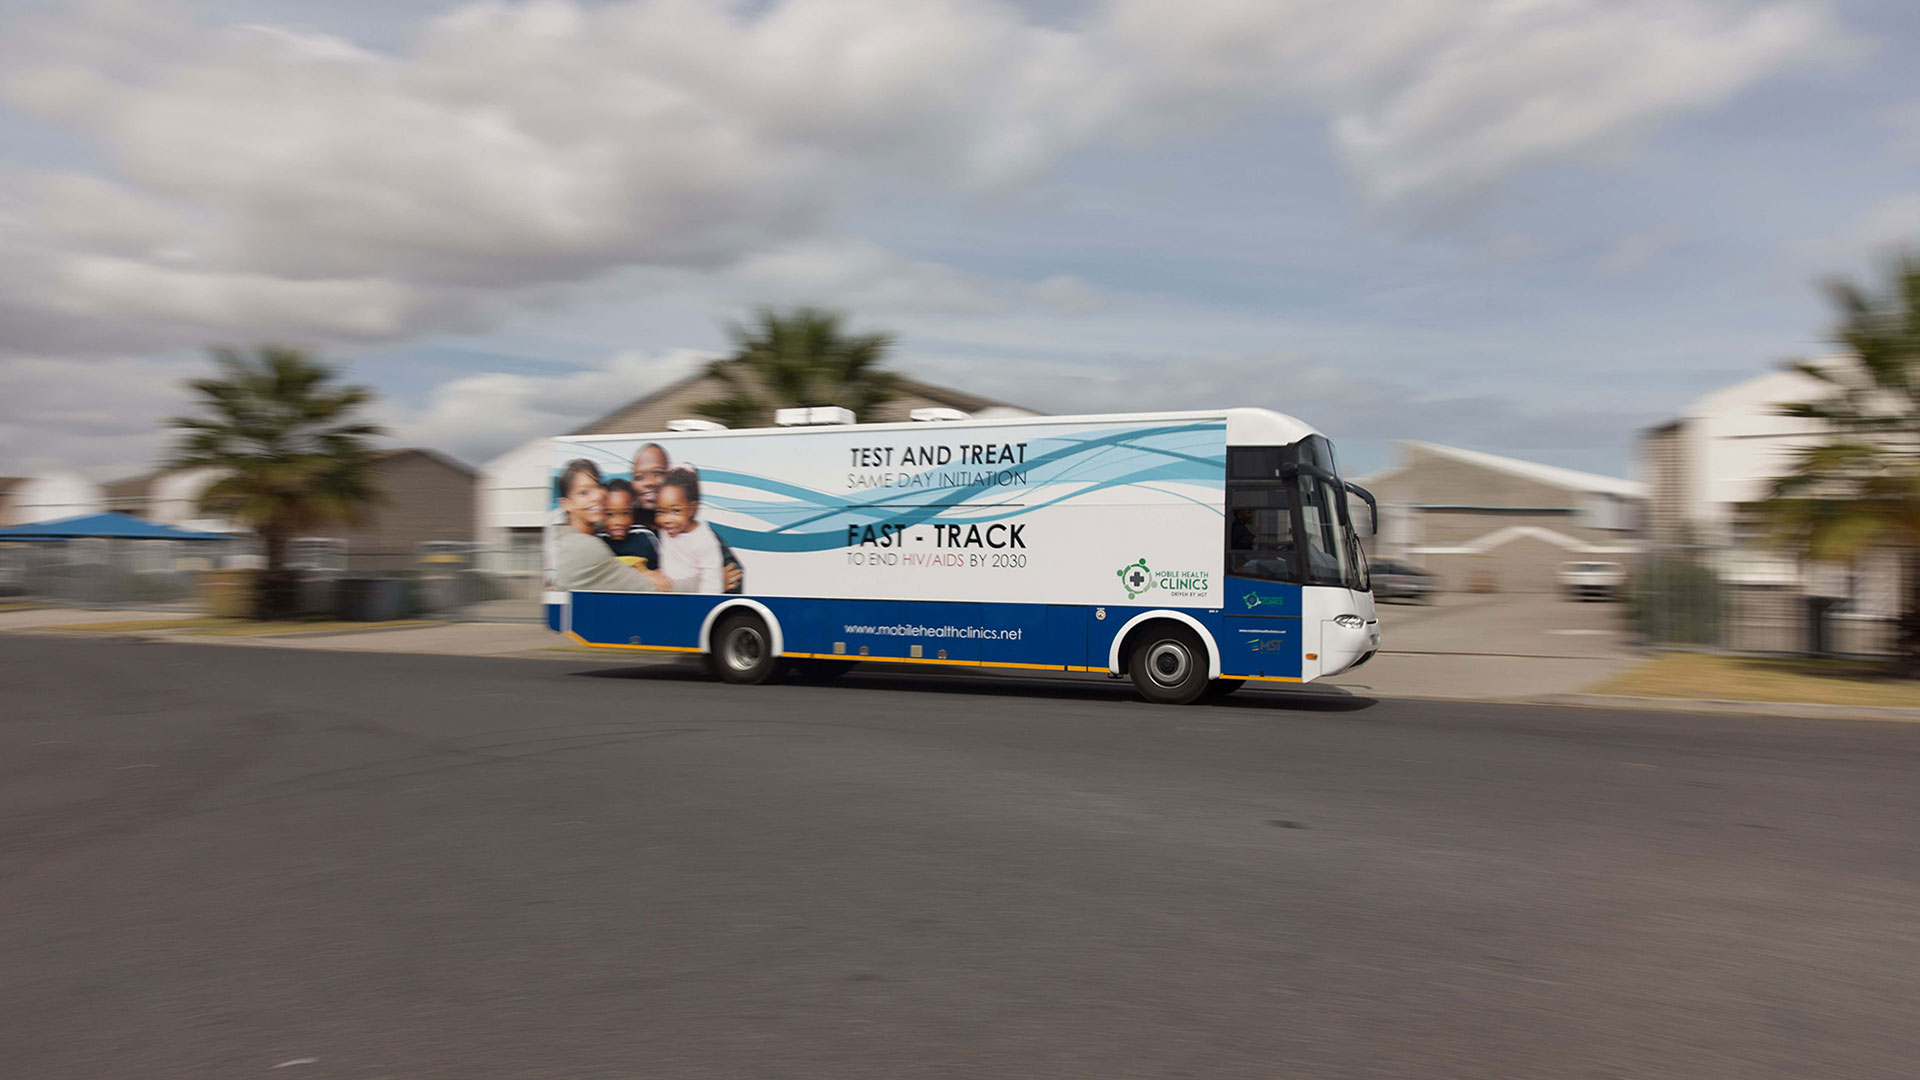 MHC mobile unit - eradicating HIV